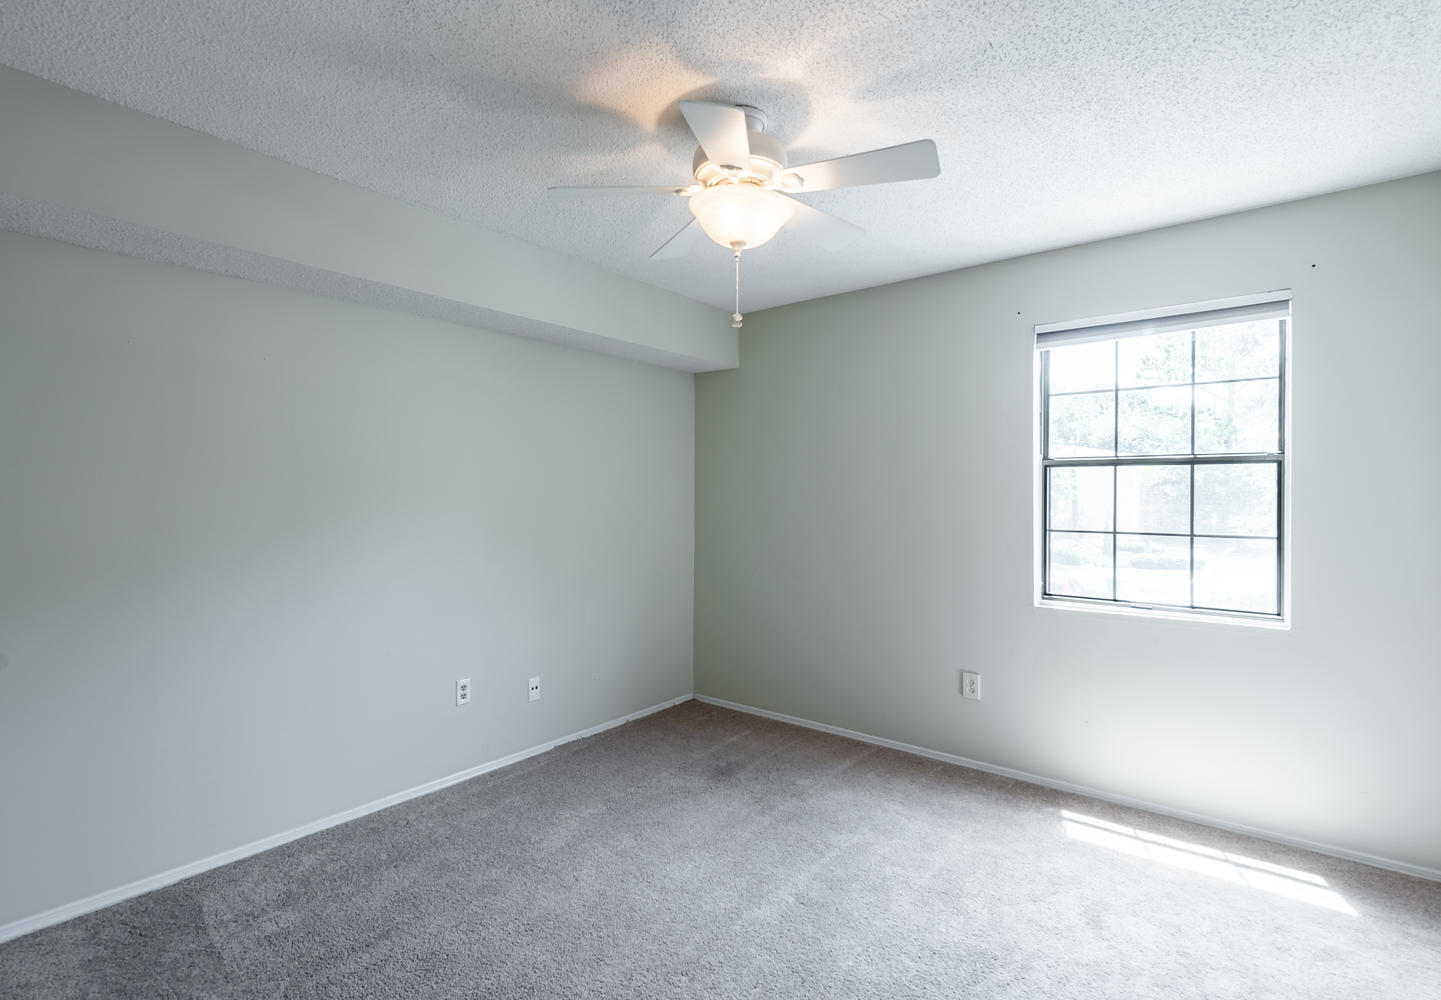 Hibben Ferry II Homes For Sale - 1054 Anna Knapp, Mount Pleasant, SC - 25